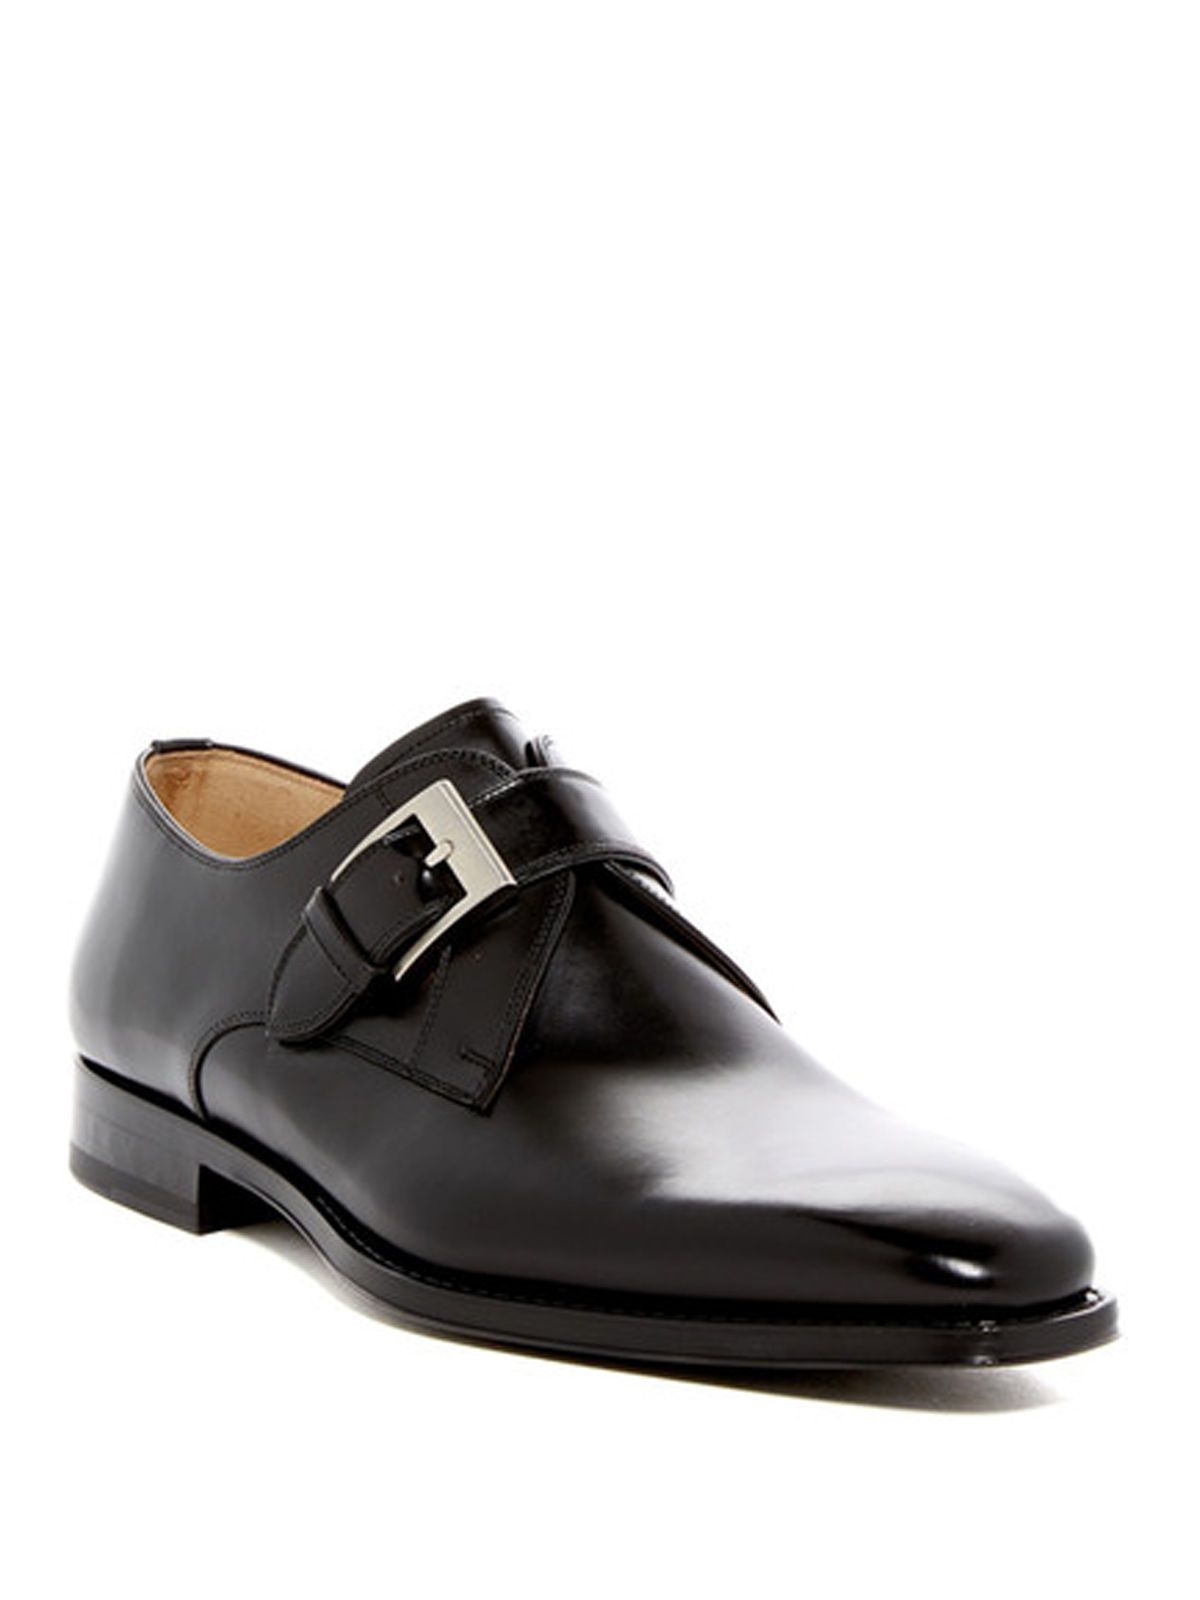 MAGNNANI Tudanca Marco Men's Single Monk Strap Leather Shoes Size: 7.5 MSRP $325